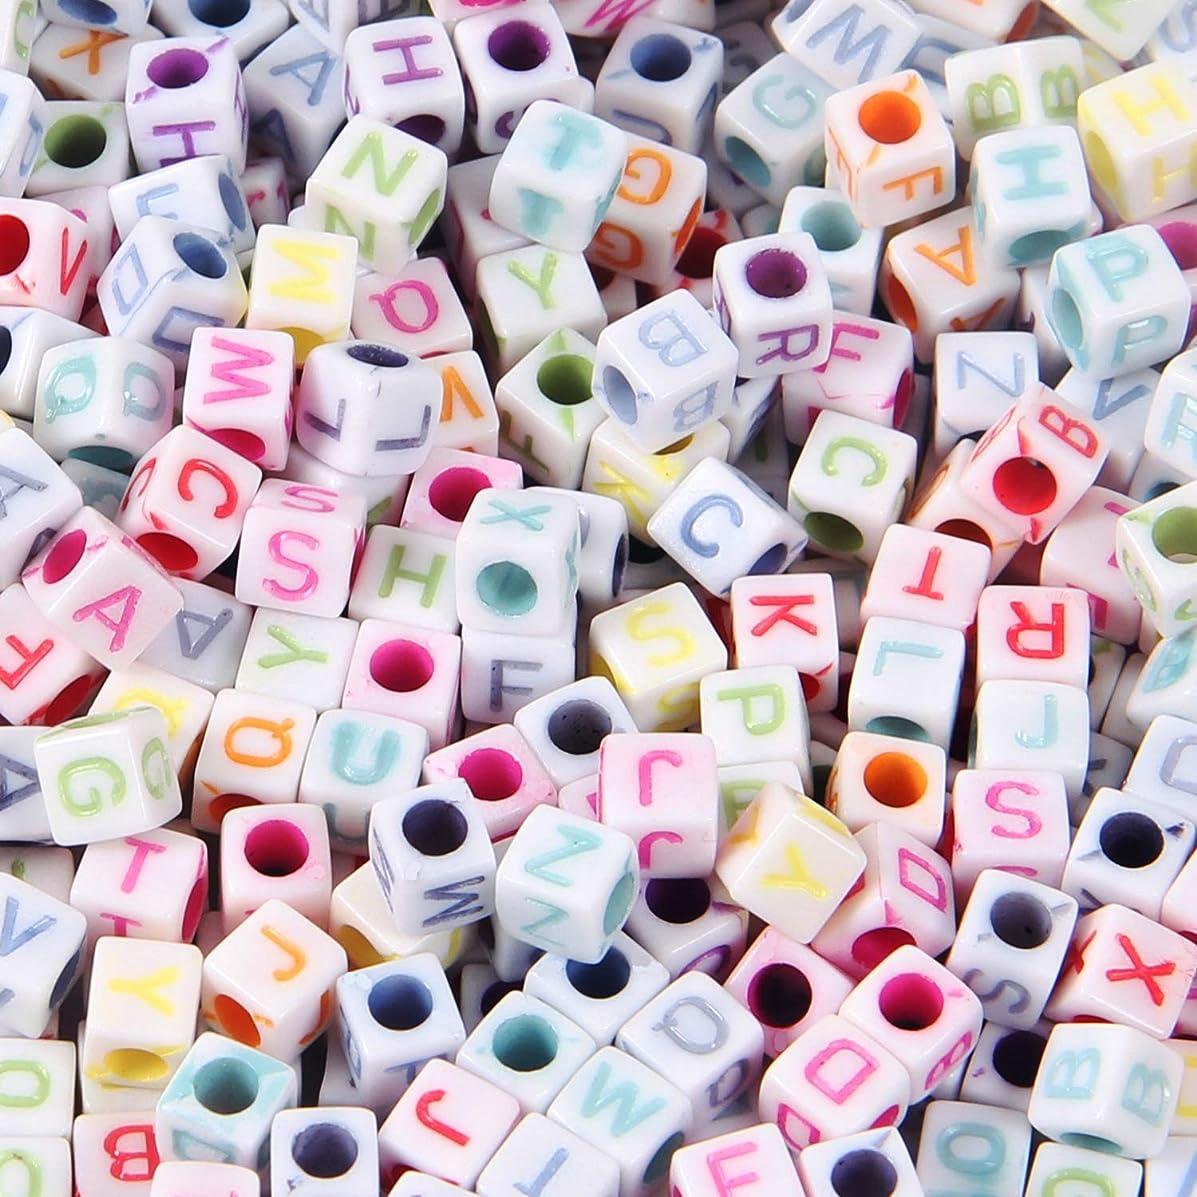 Kbraveo 1500Pcs 6x6mm Alphabet Letter A-Z Cube Beads,Acrylic Alphabet Cube Beads for Jewelry Making,Bracelets,Necklace Making